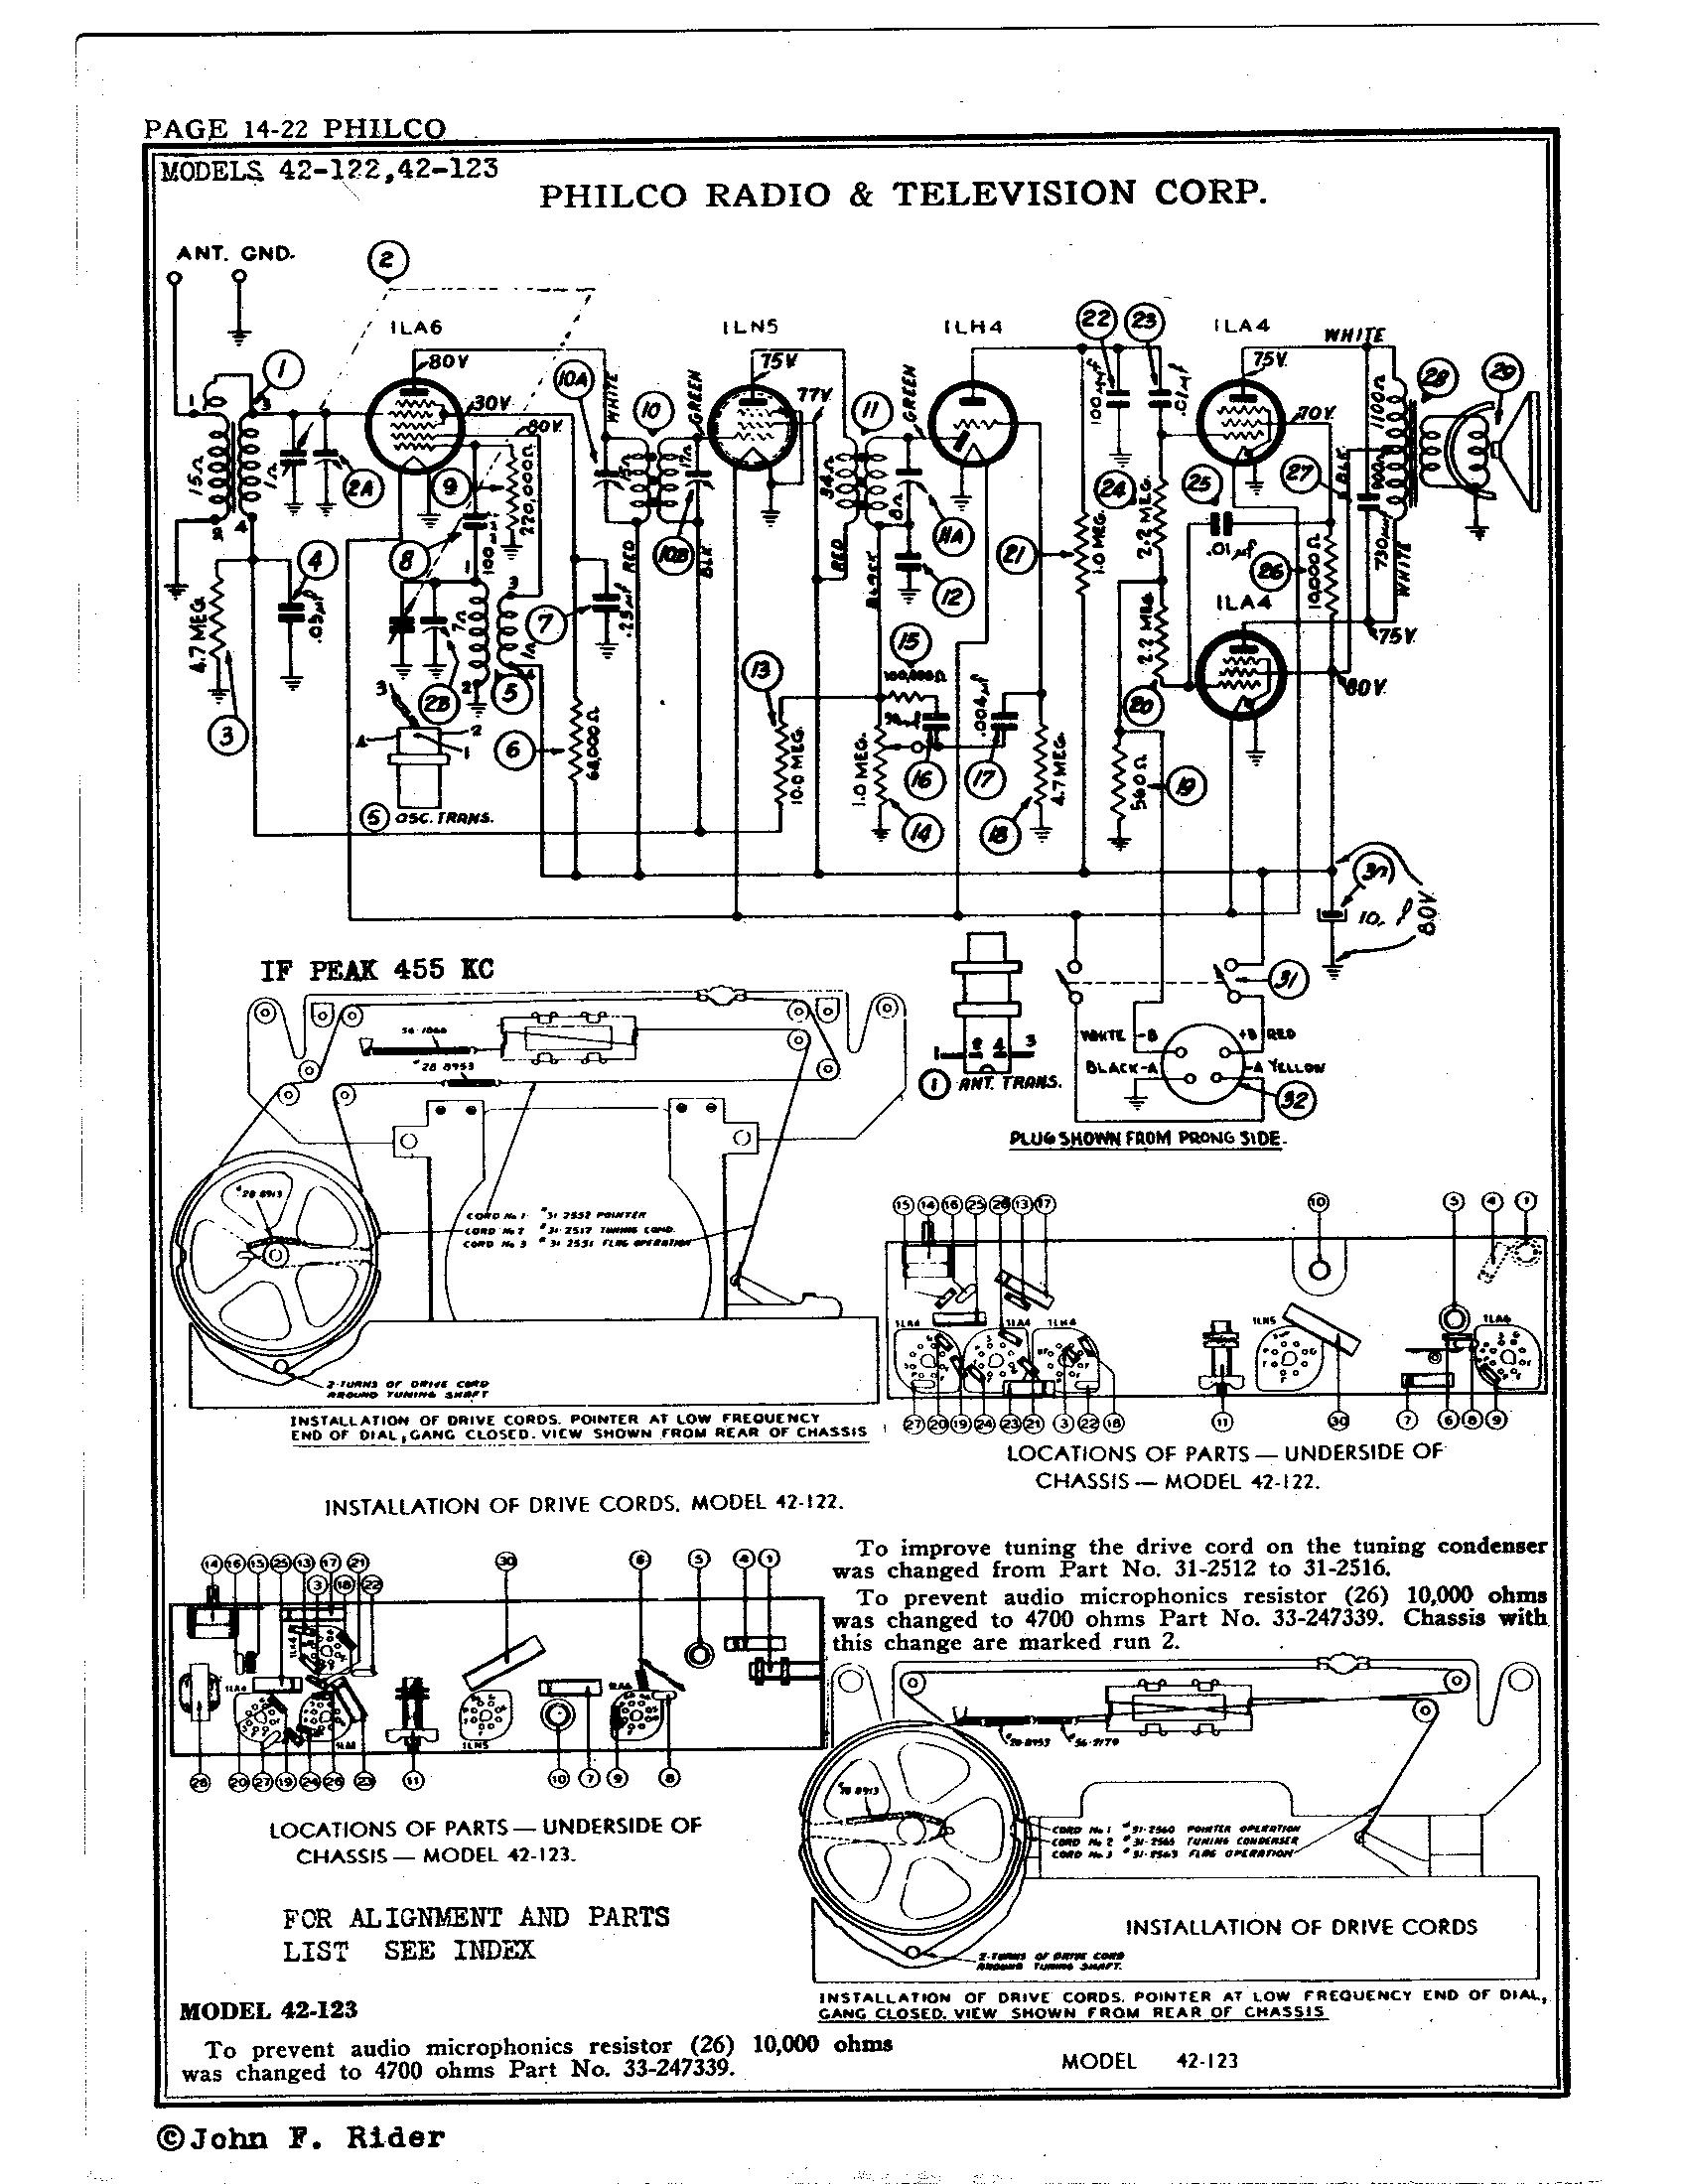 Philco Radio & Television Corp  42-123 | Antique Electronic Supply